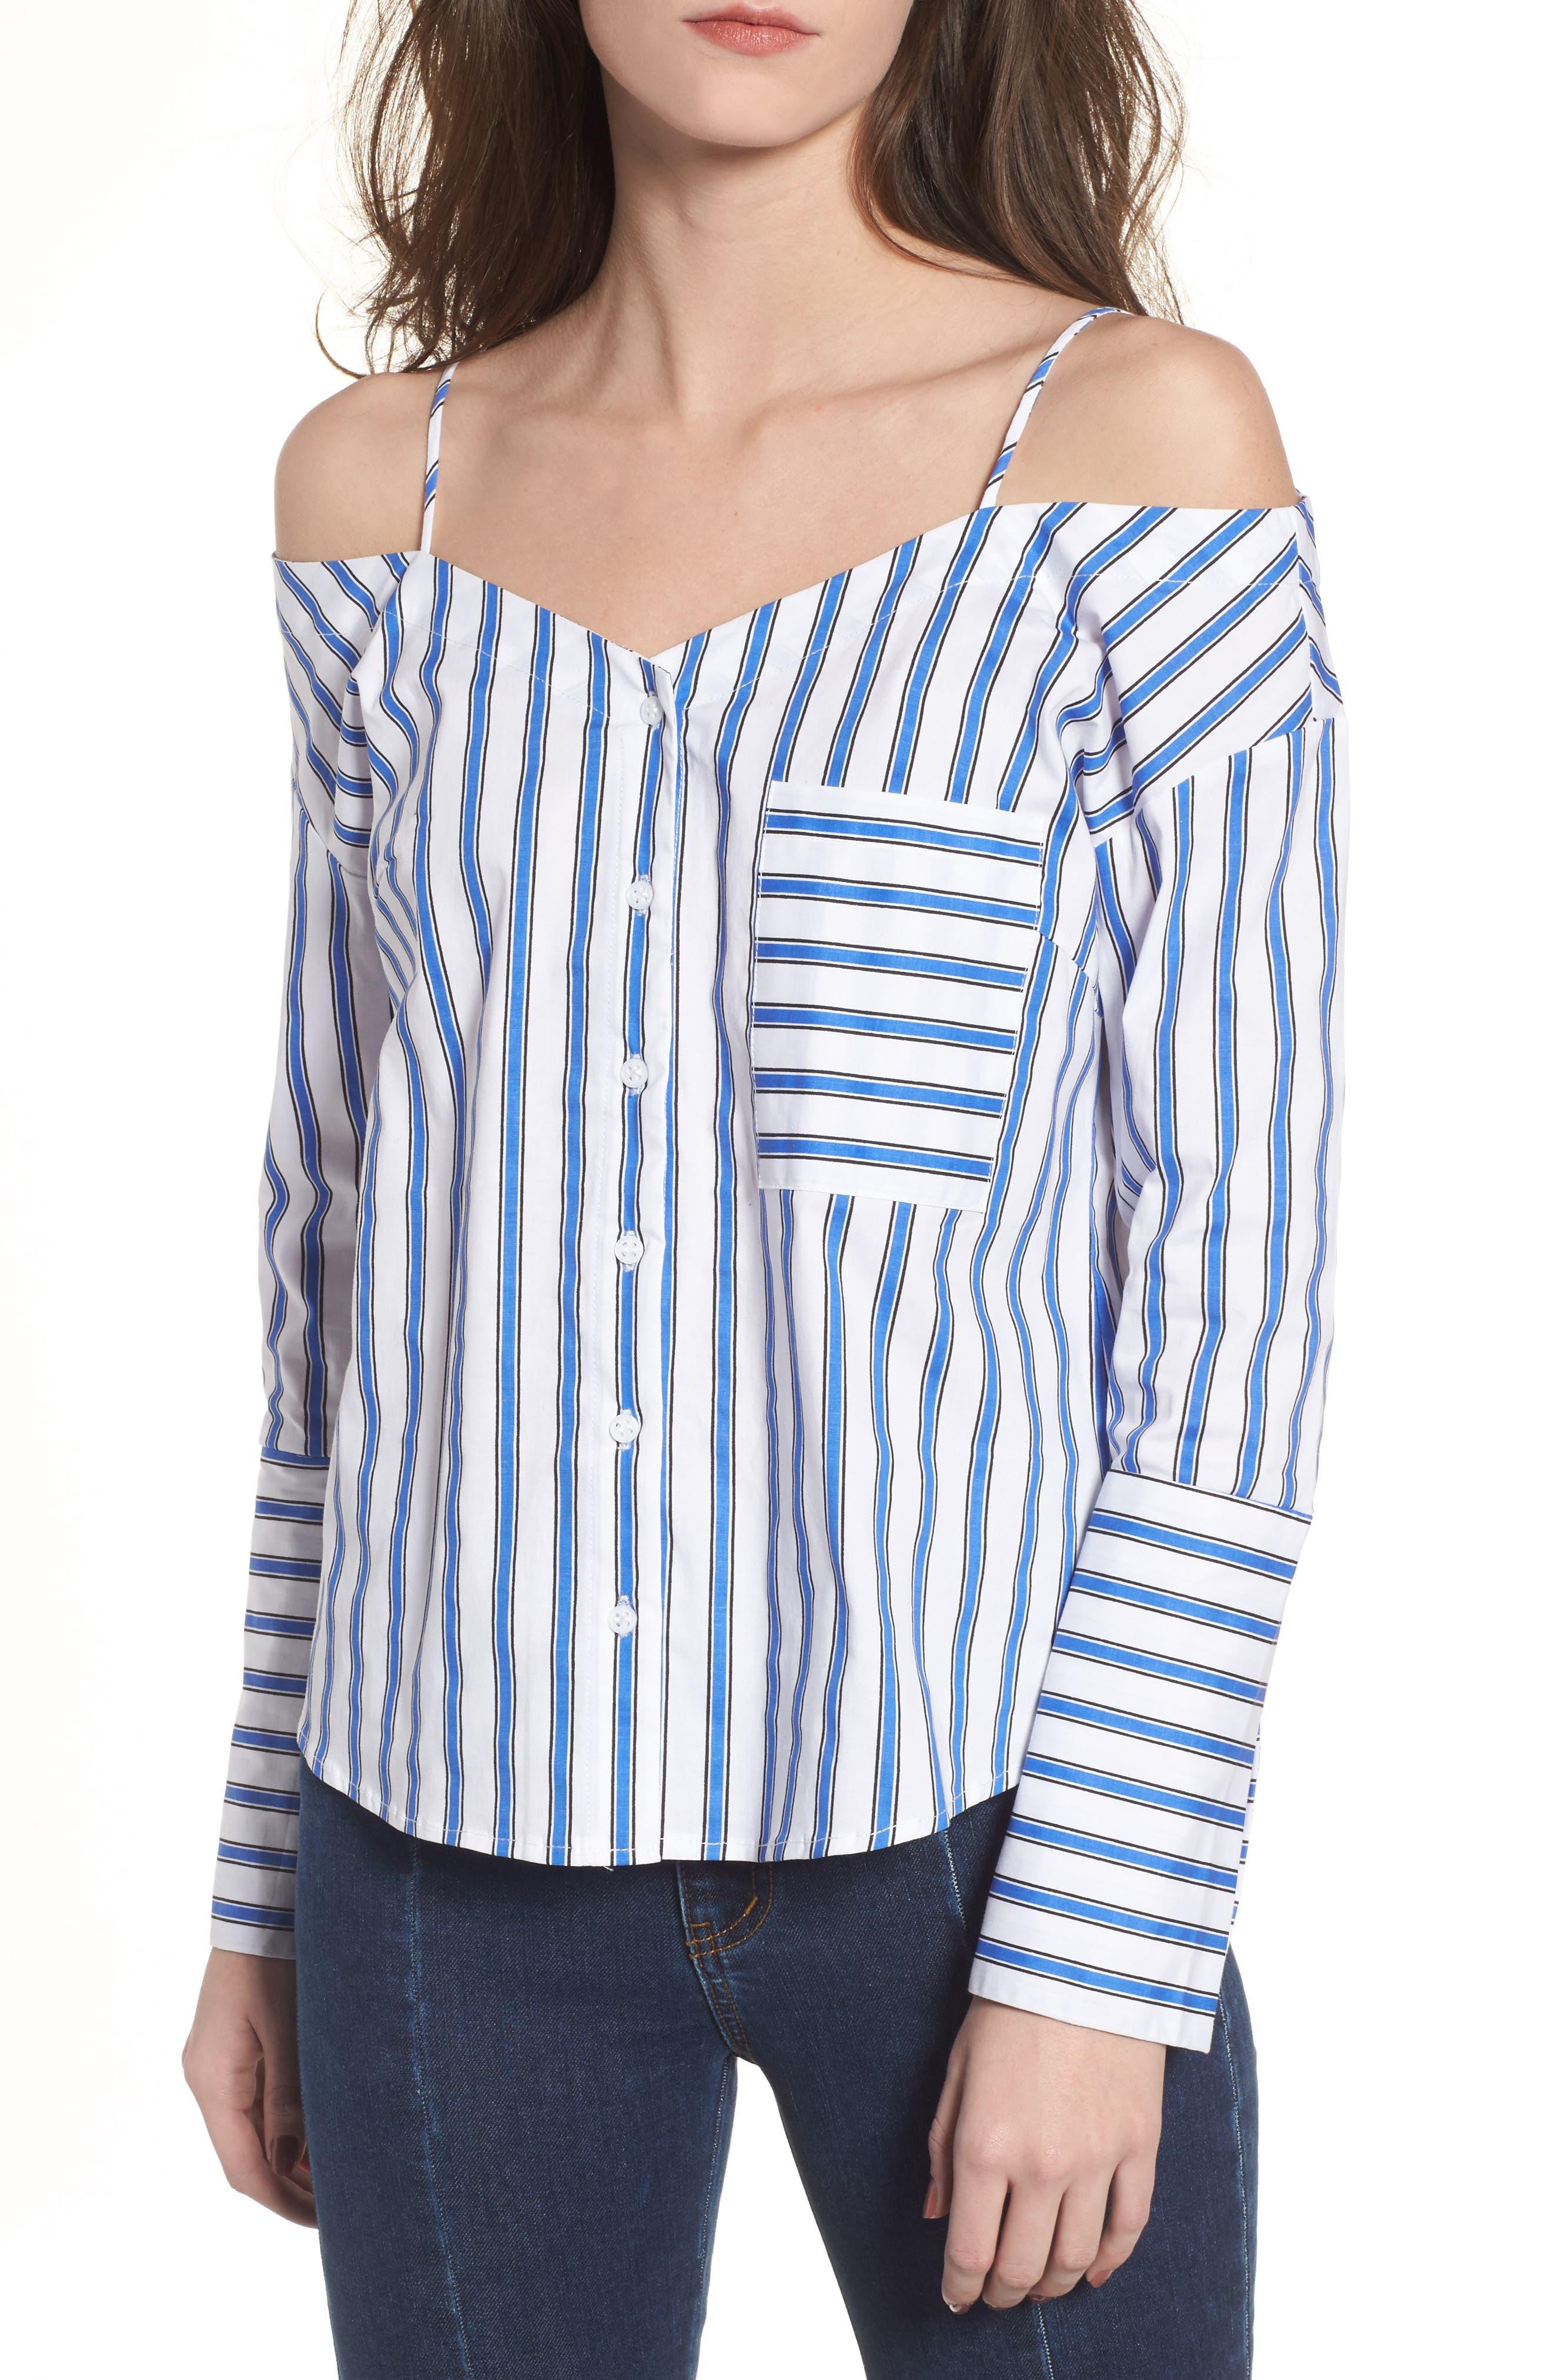 CODEXMODE Stripe Cold Shoulder Button Top